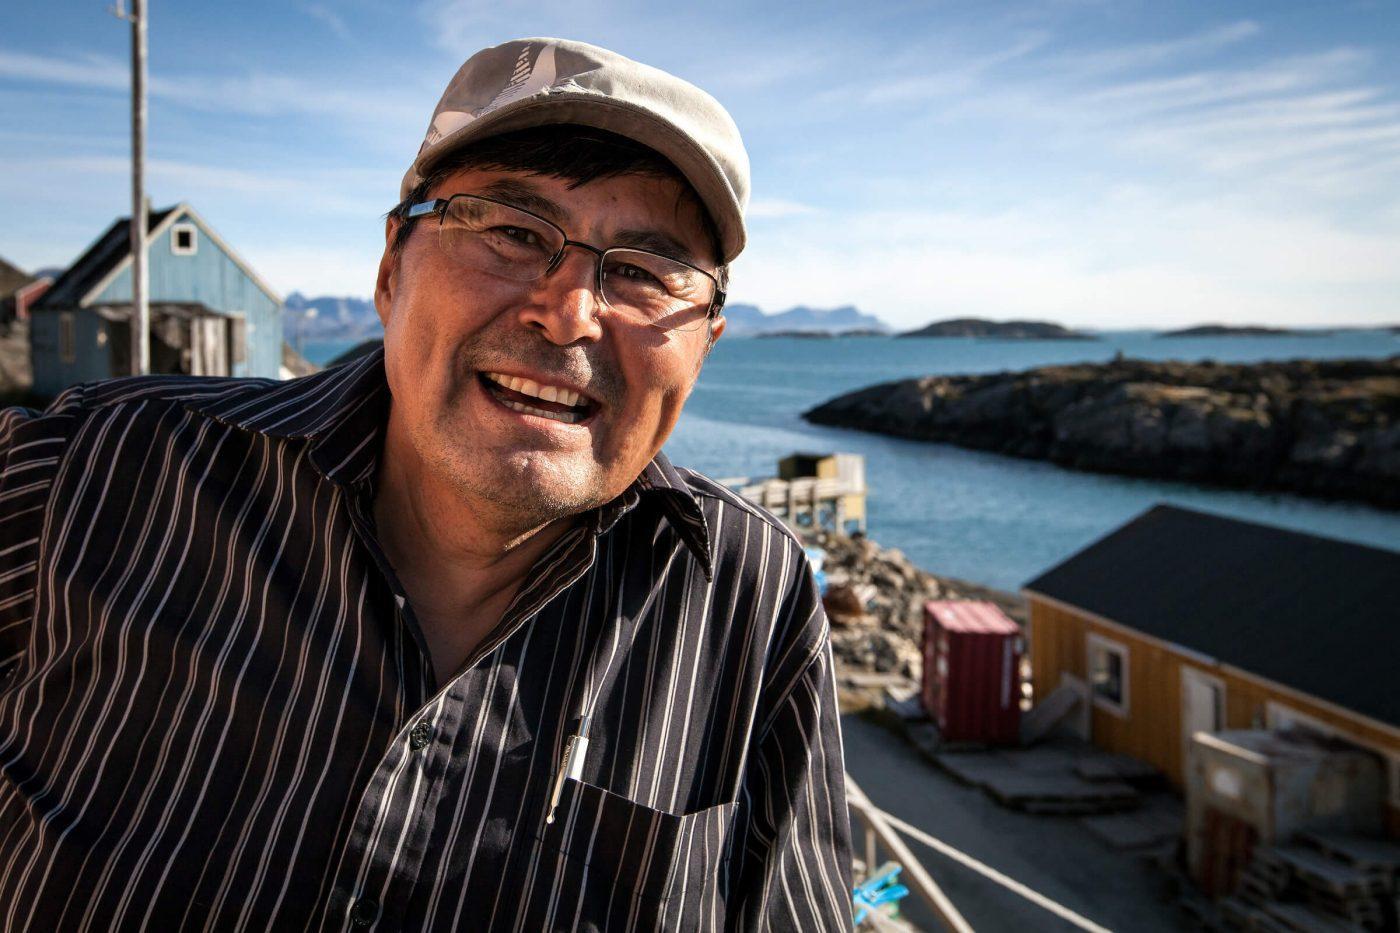 Kangaamiut school principal Barnabas Larsen from Greenland. Photo by Mads Pihl